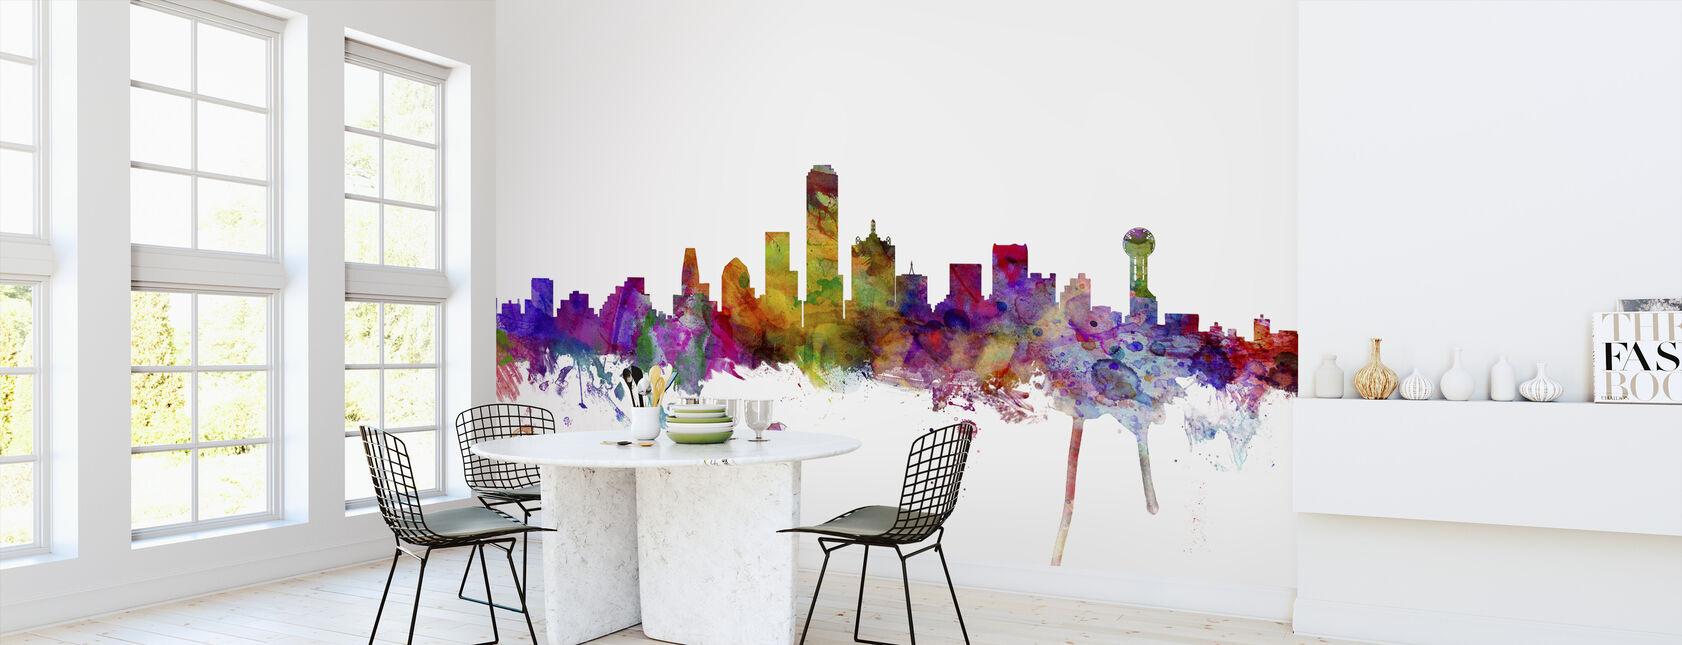 Dallas Texas Skyline - Wallpaper - Kitchen